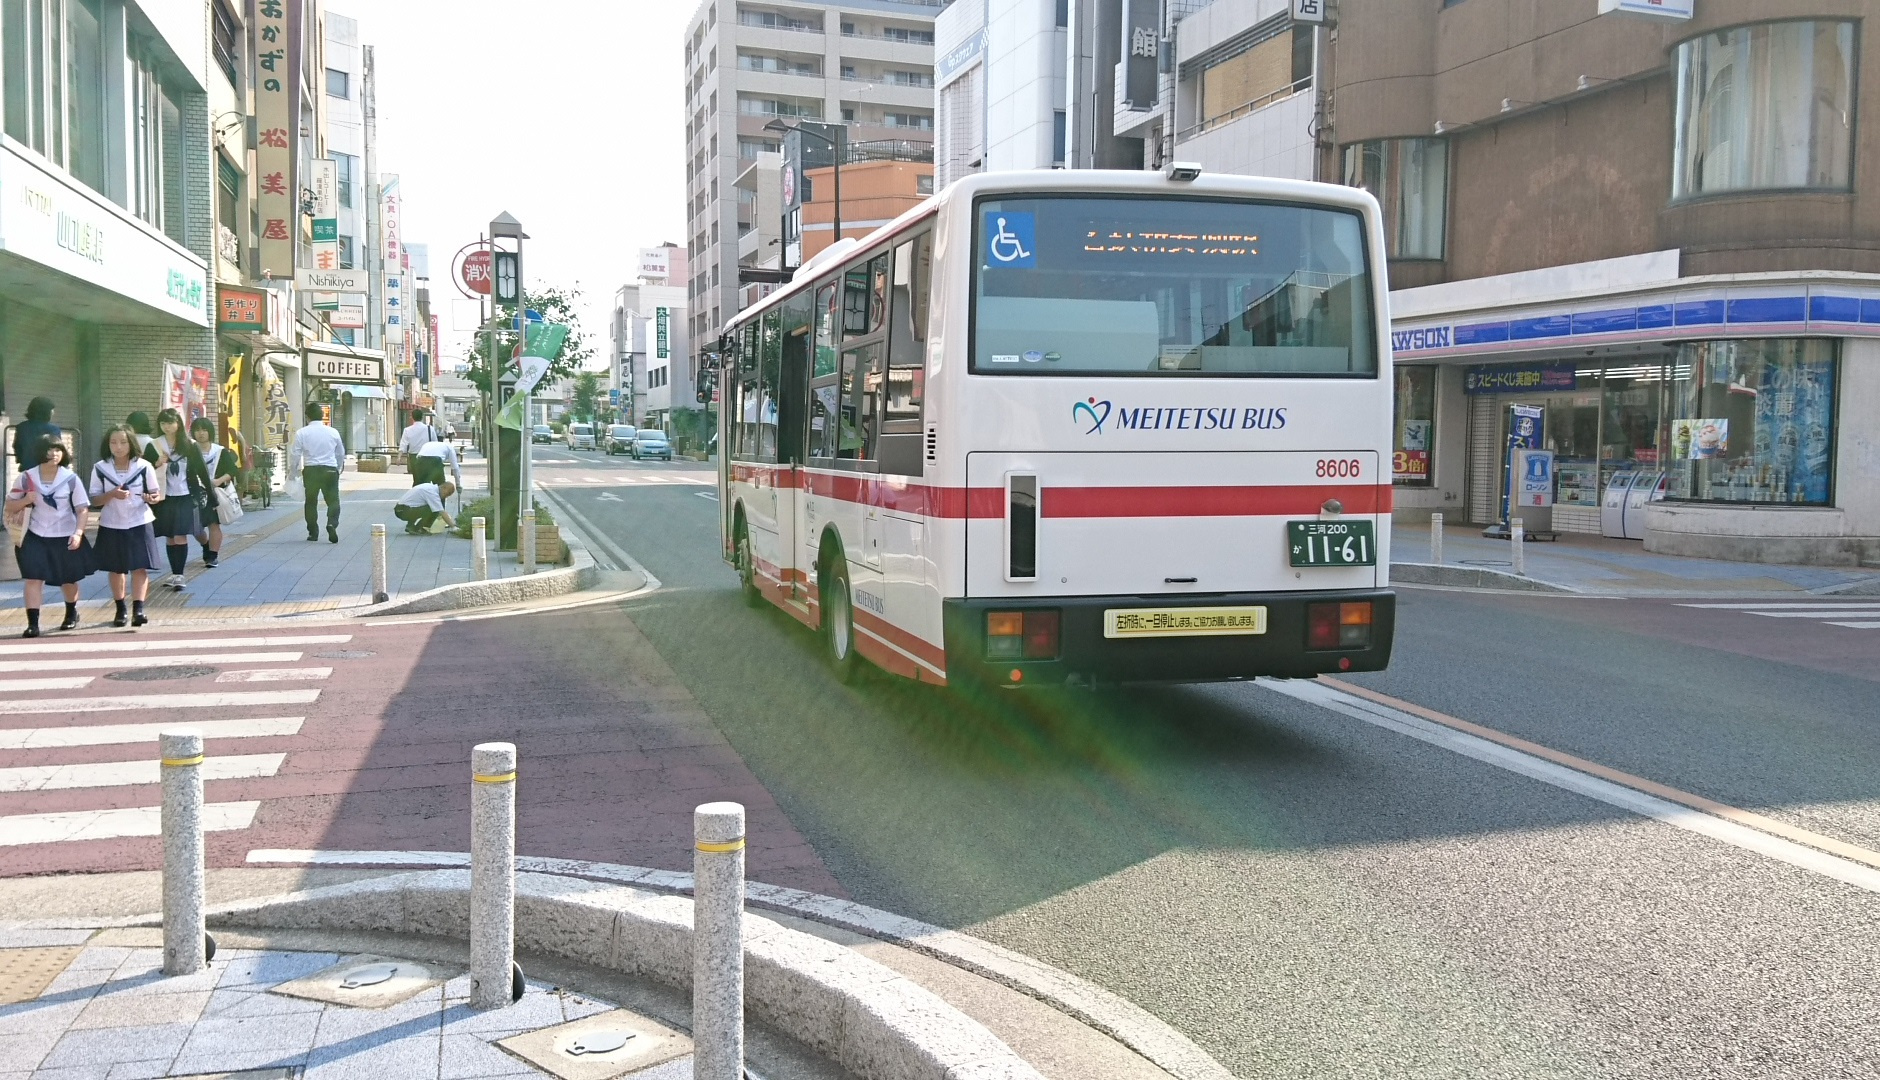 2017.6.16 御幸本町交差点 - 名鉄バス (1) 1880-1080